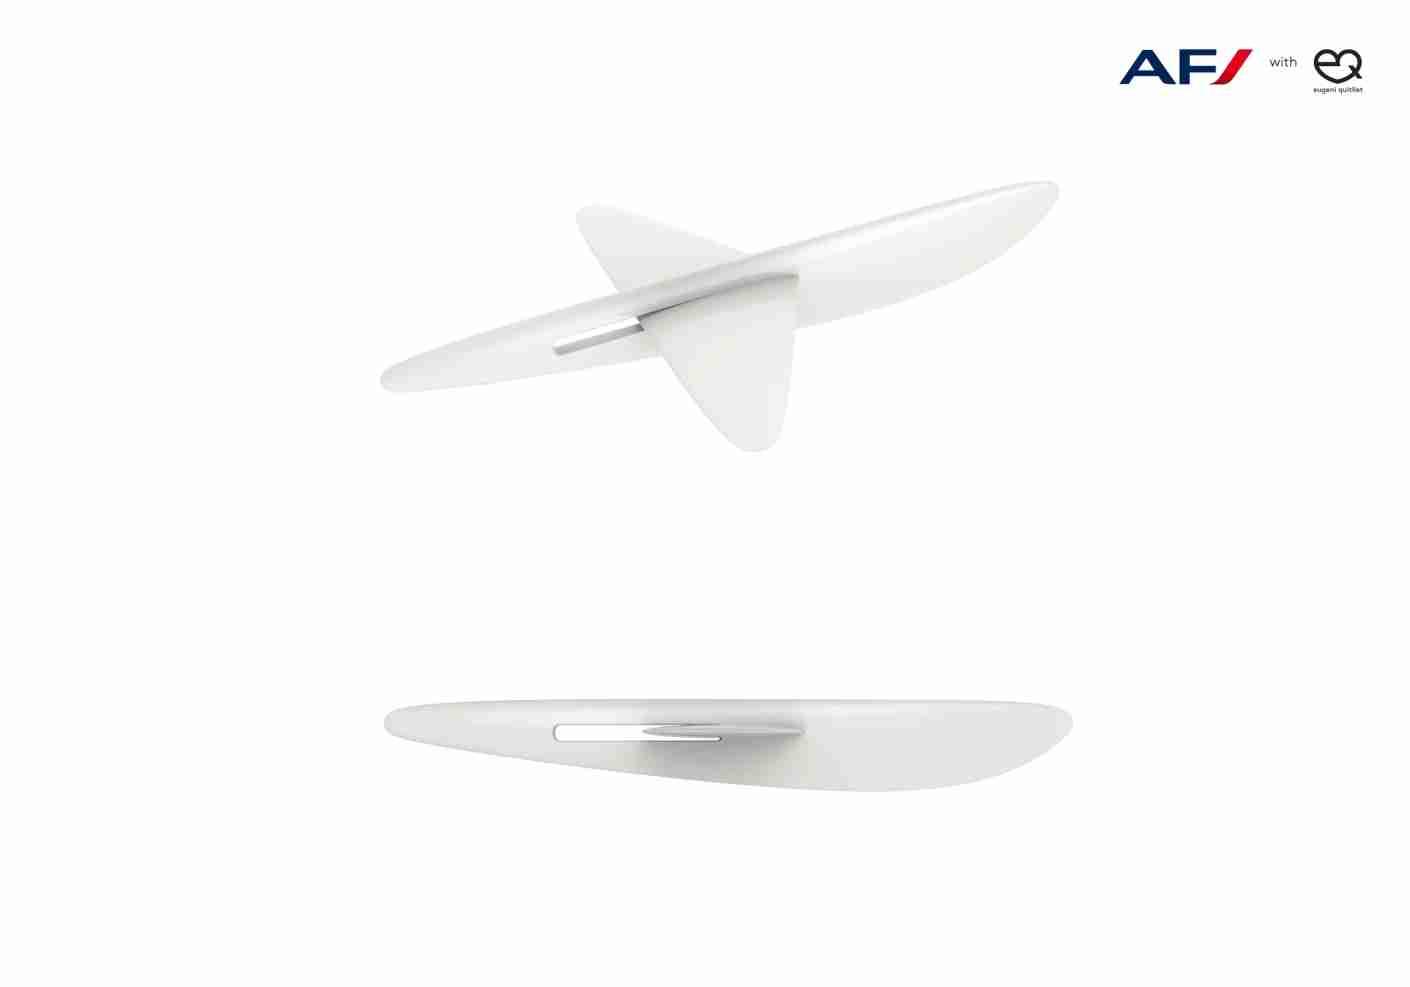 The airplane utensils. Image courtesy of Eugeni Quitllet.